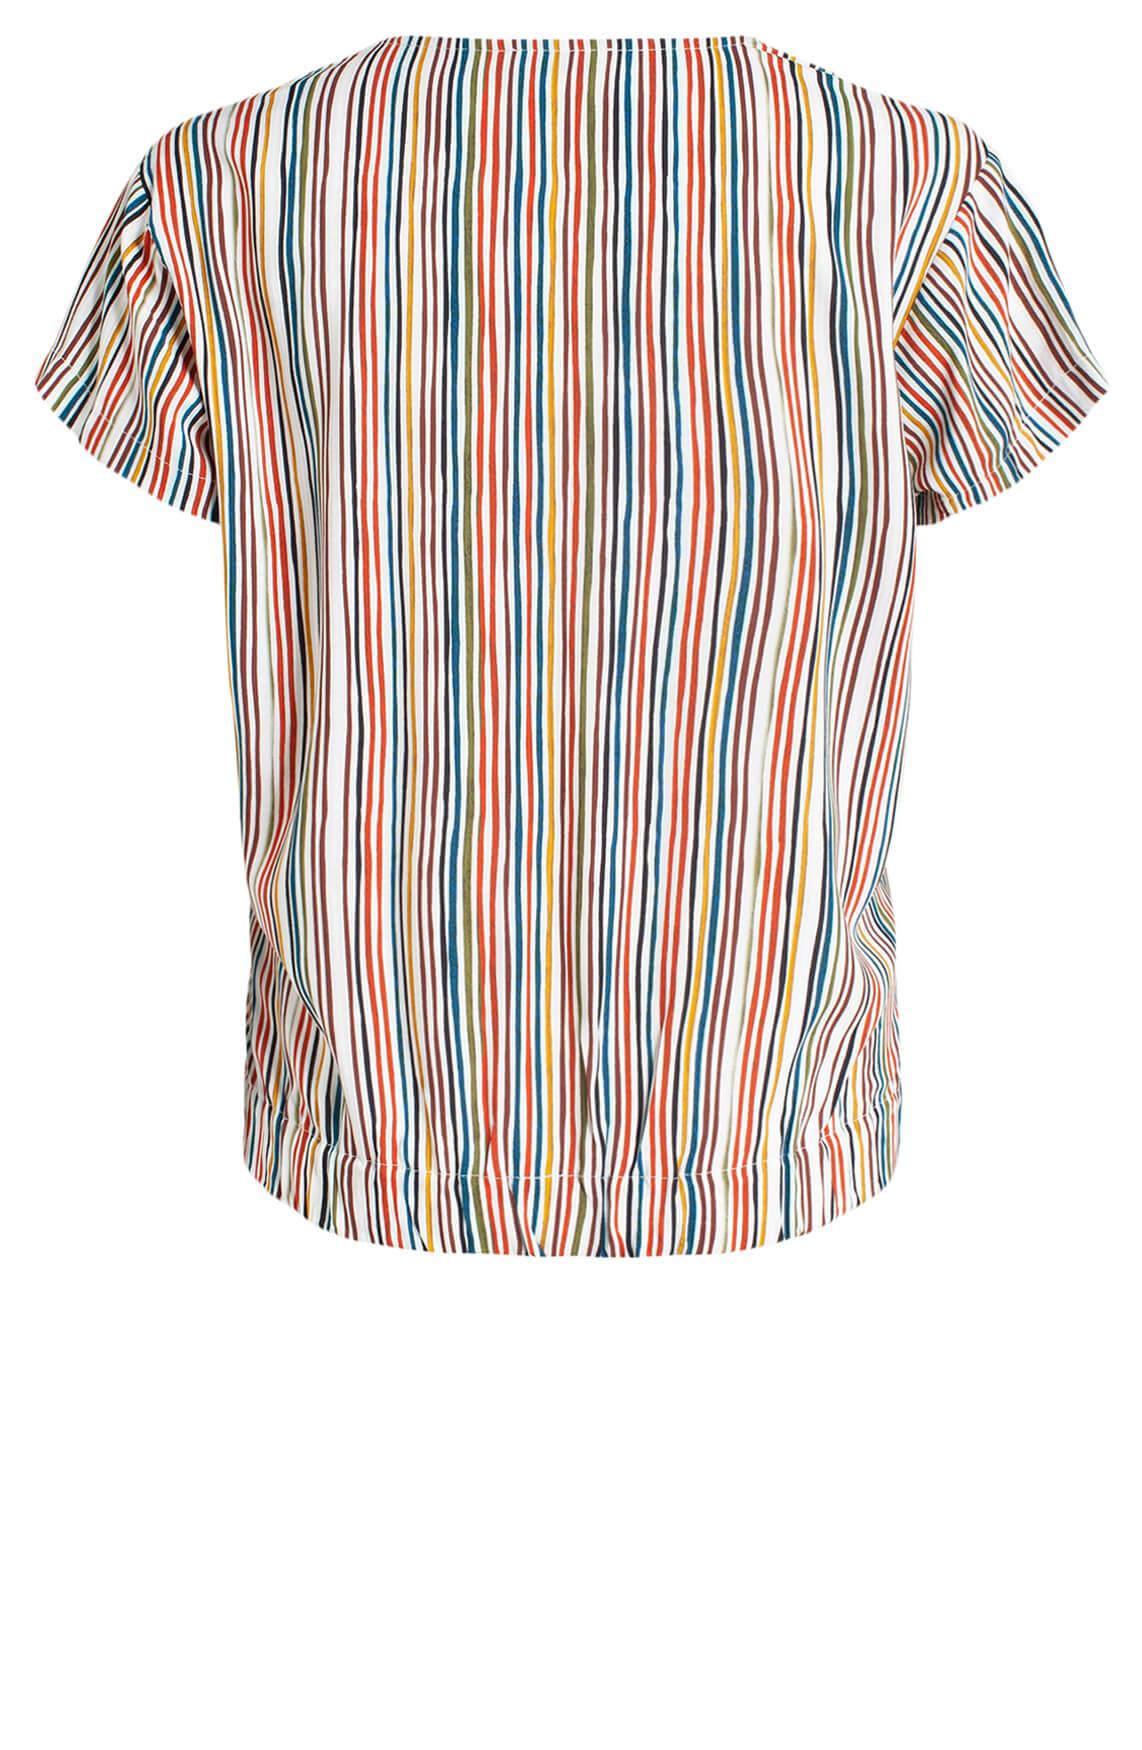 Anna Dames Gestreepte blouse MultiColor